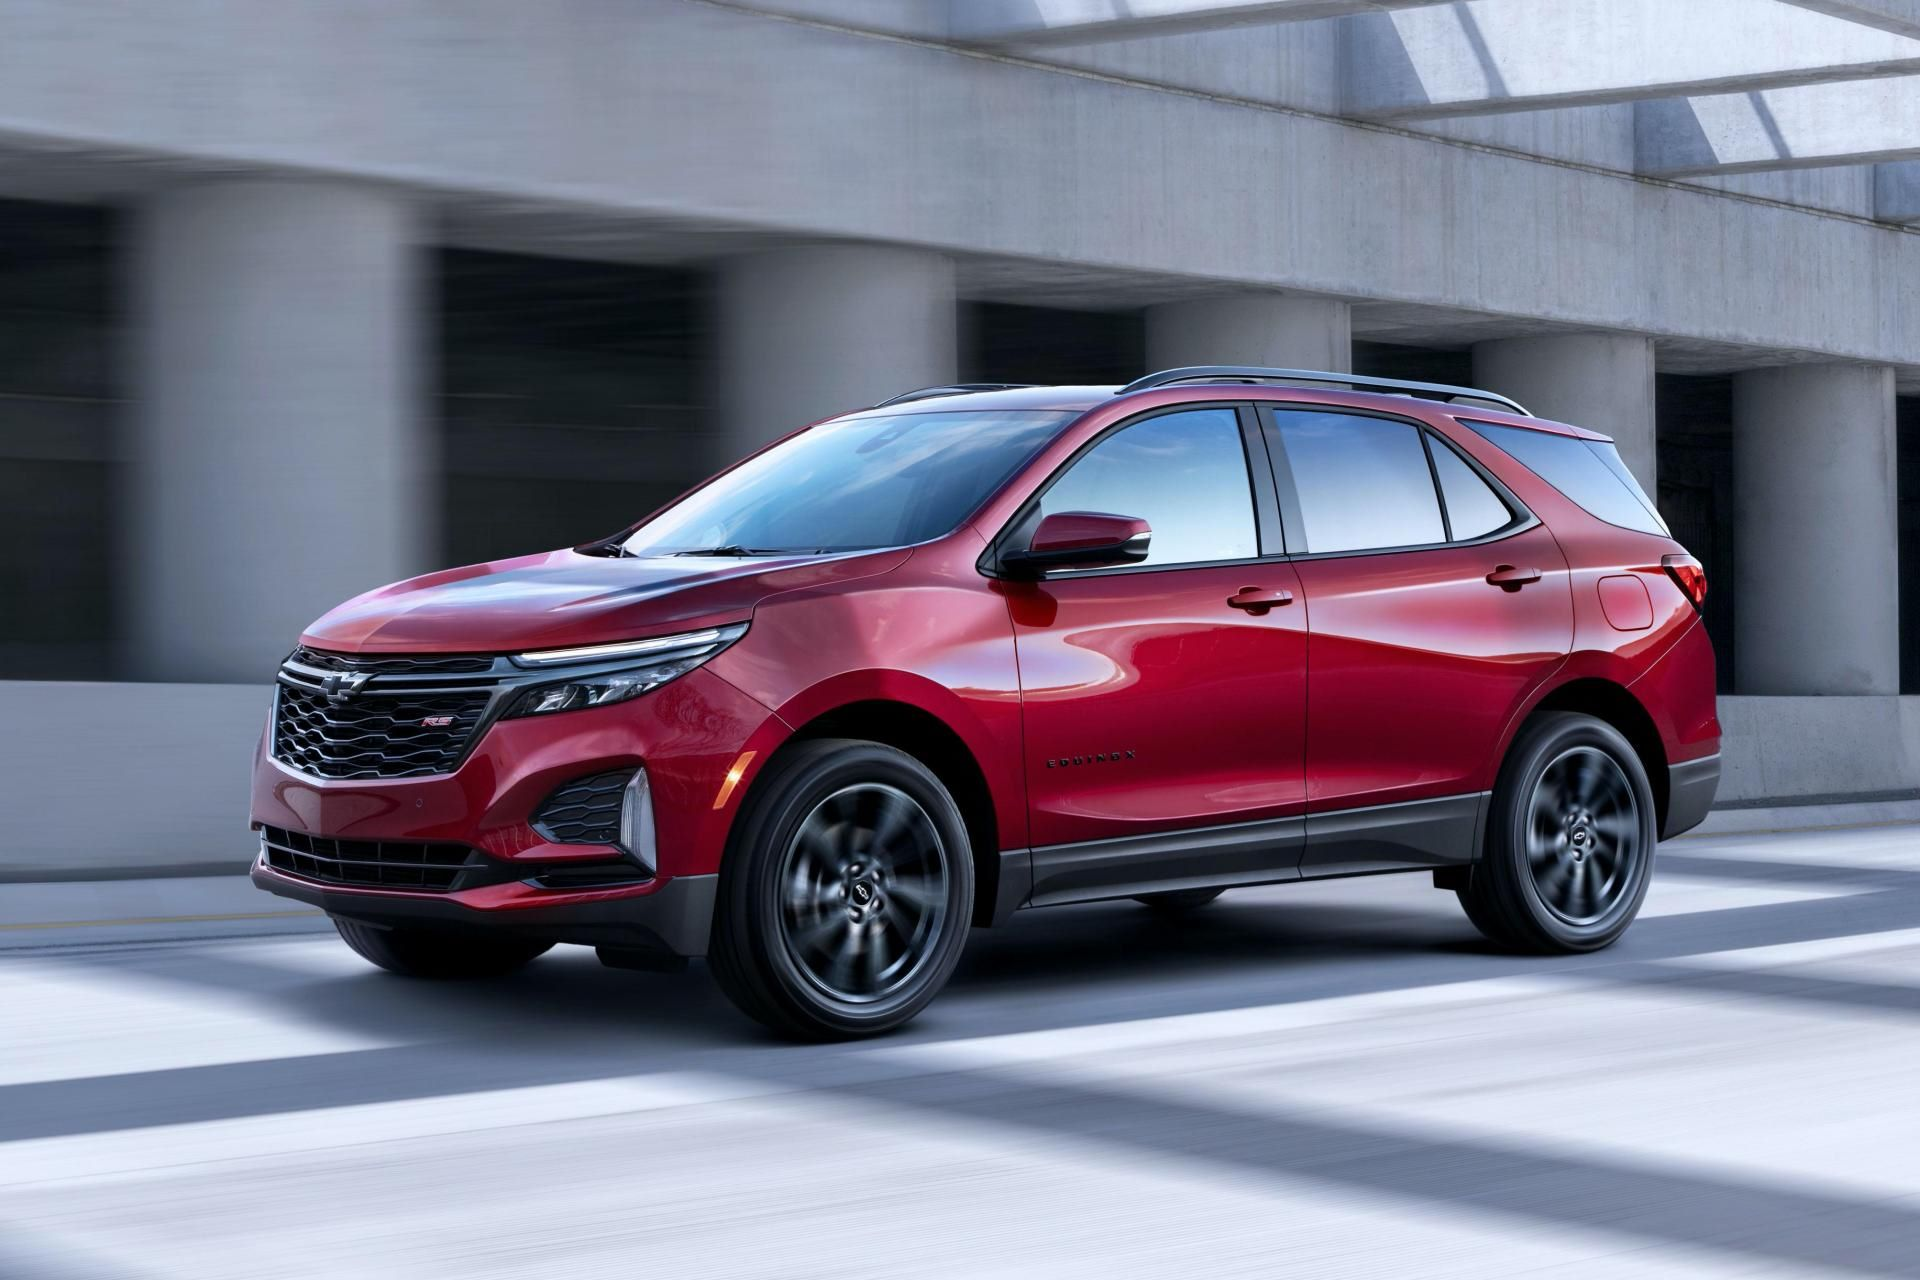 Chevrolet-Equinox-facelift-2020-2